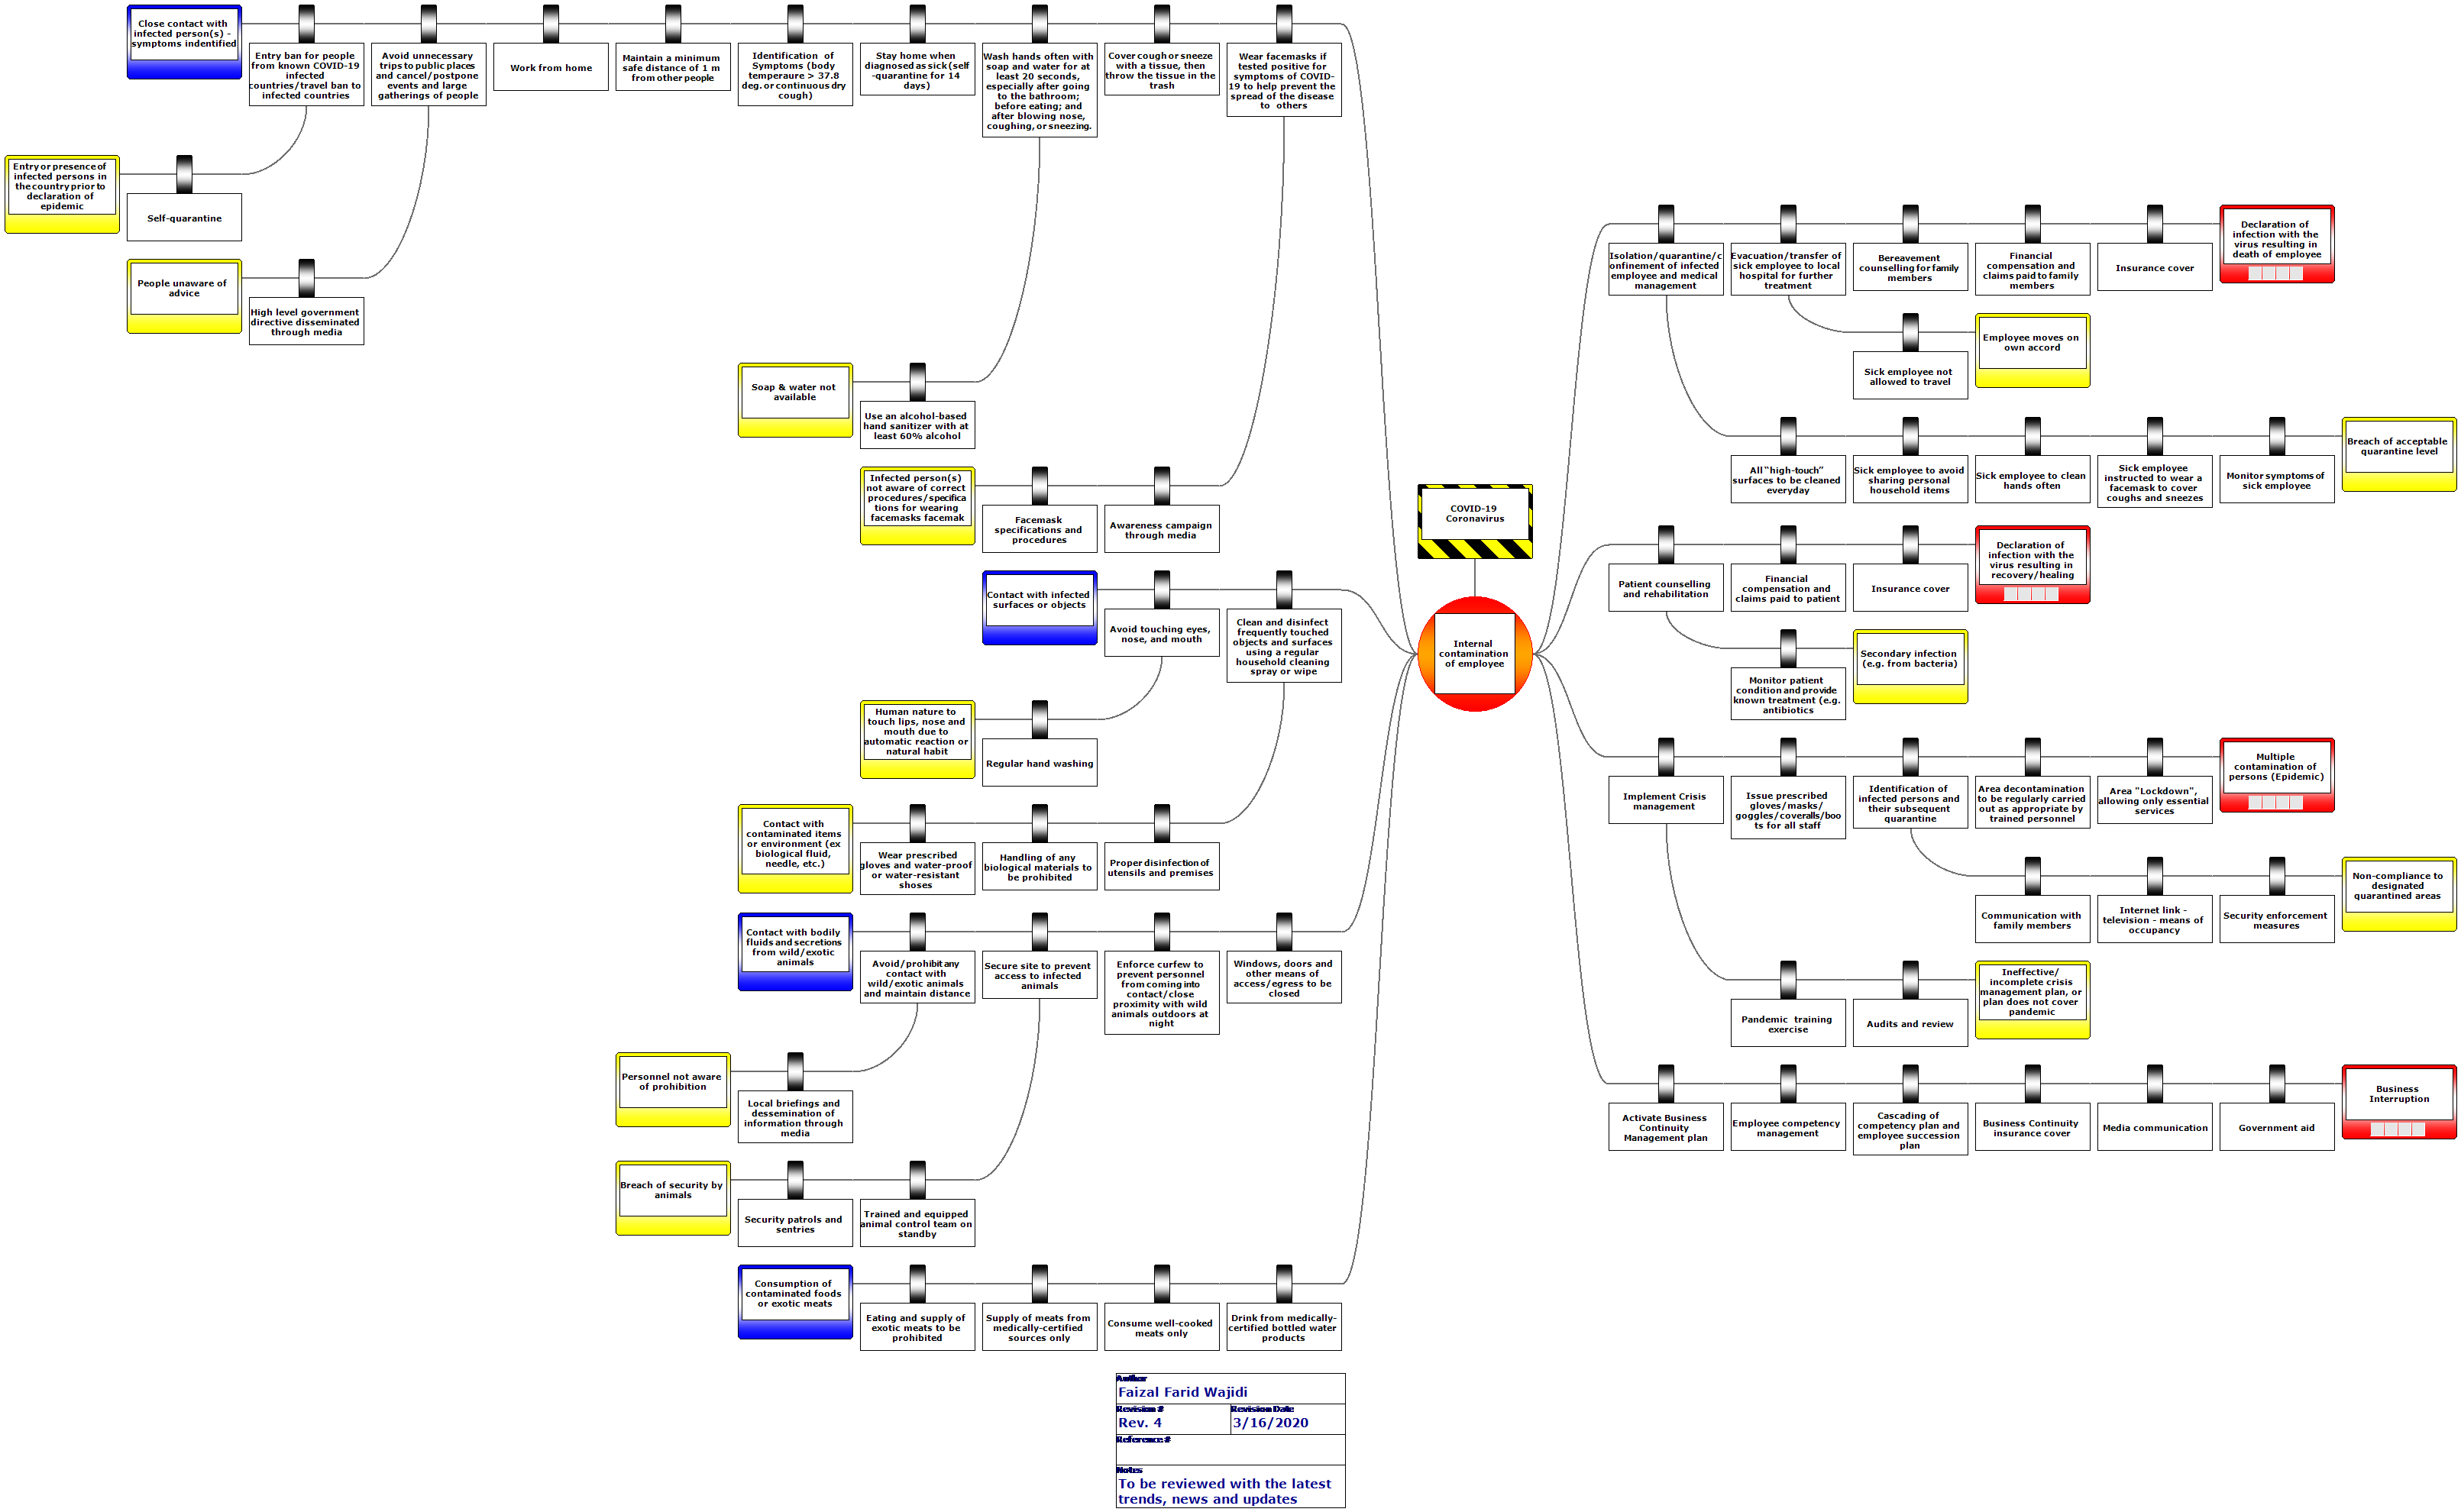 Bowtie Diagram - COVID-19-Coronavirus-Pace-Up-Sdn-Bhd